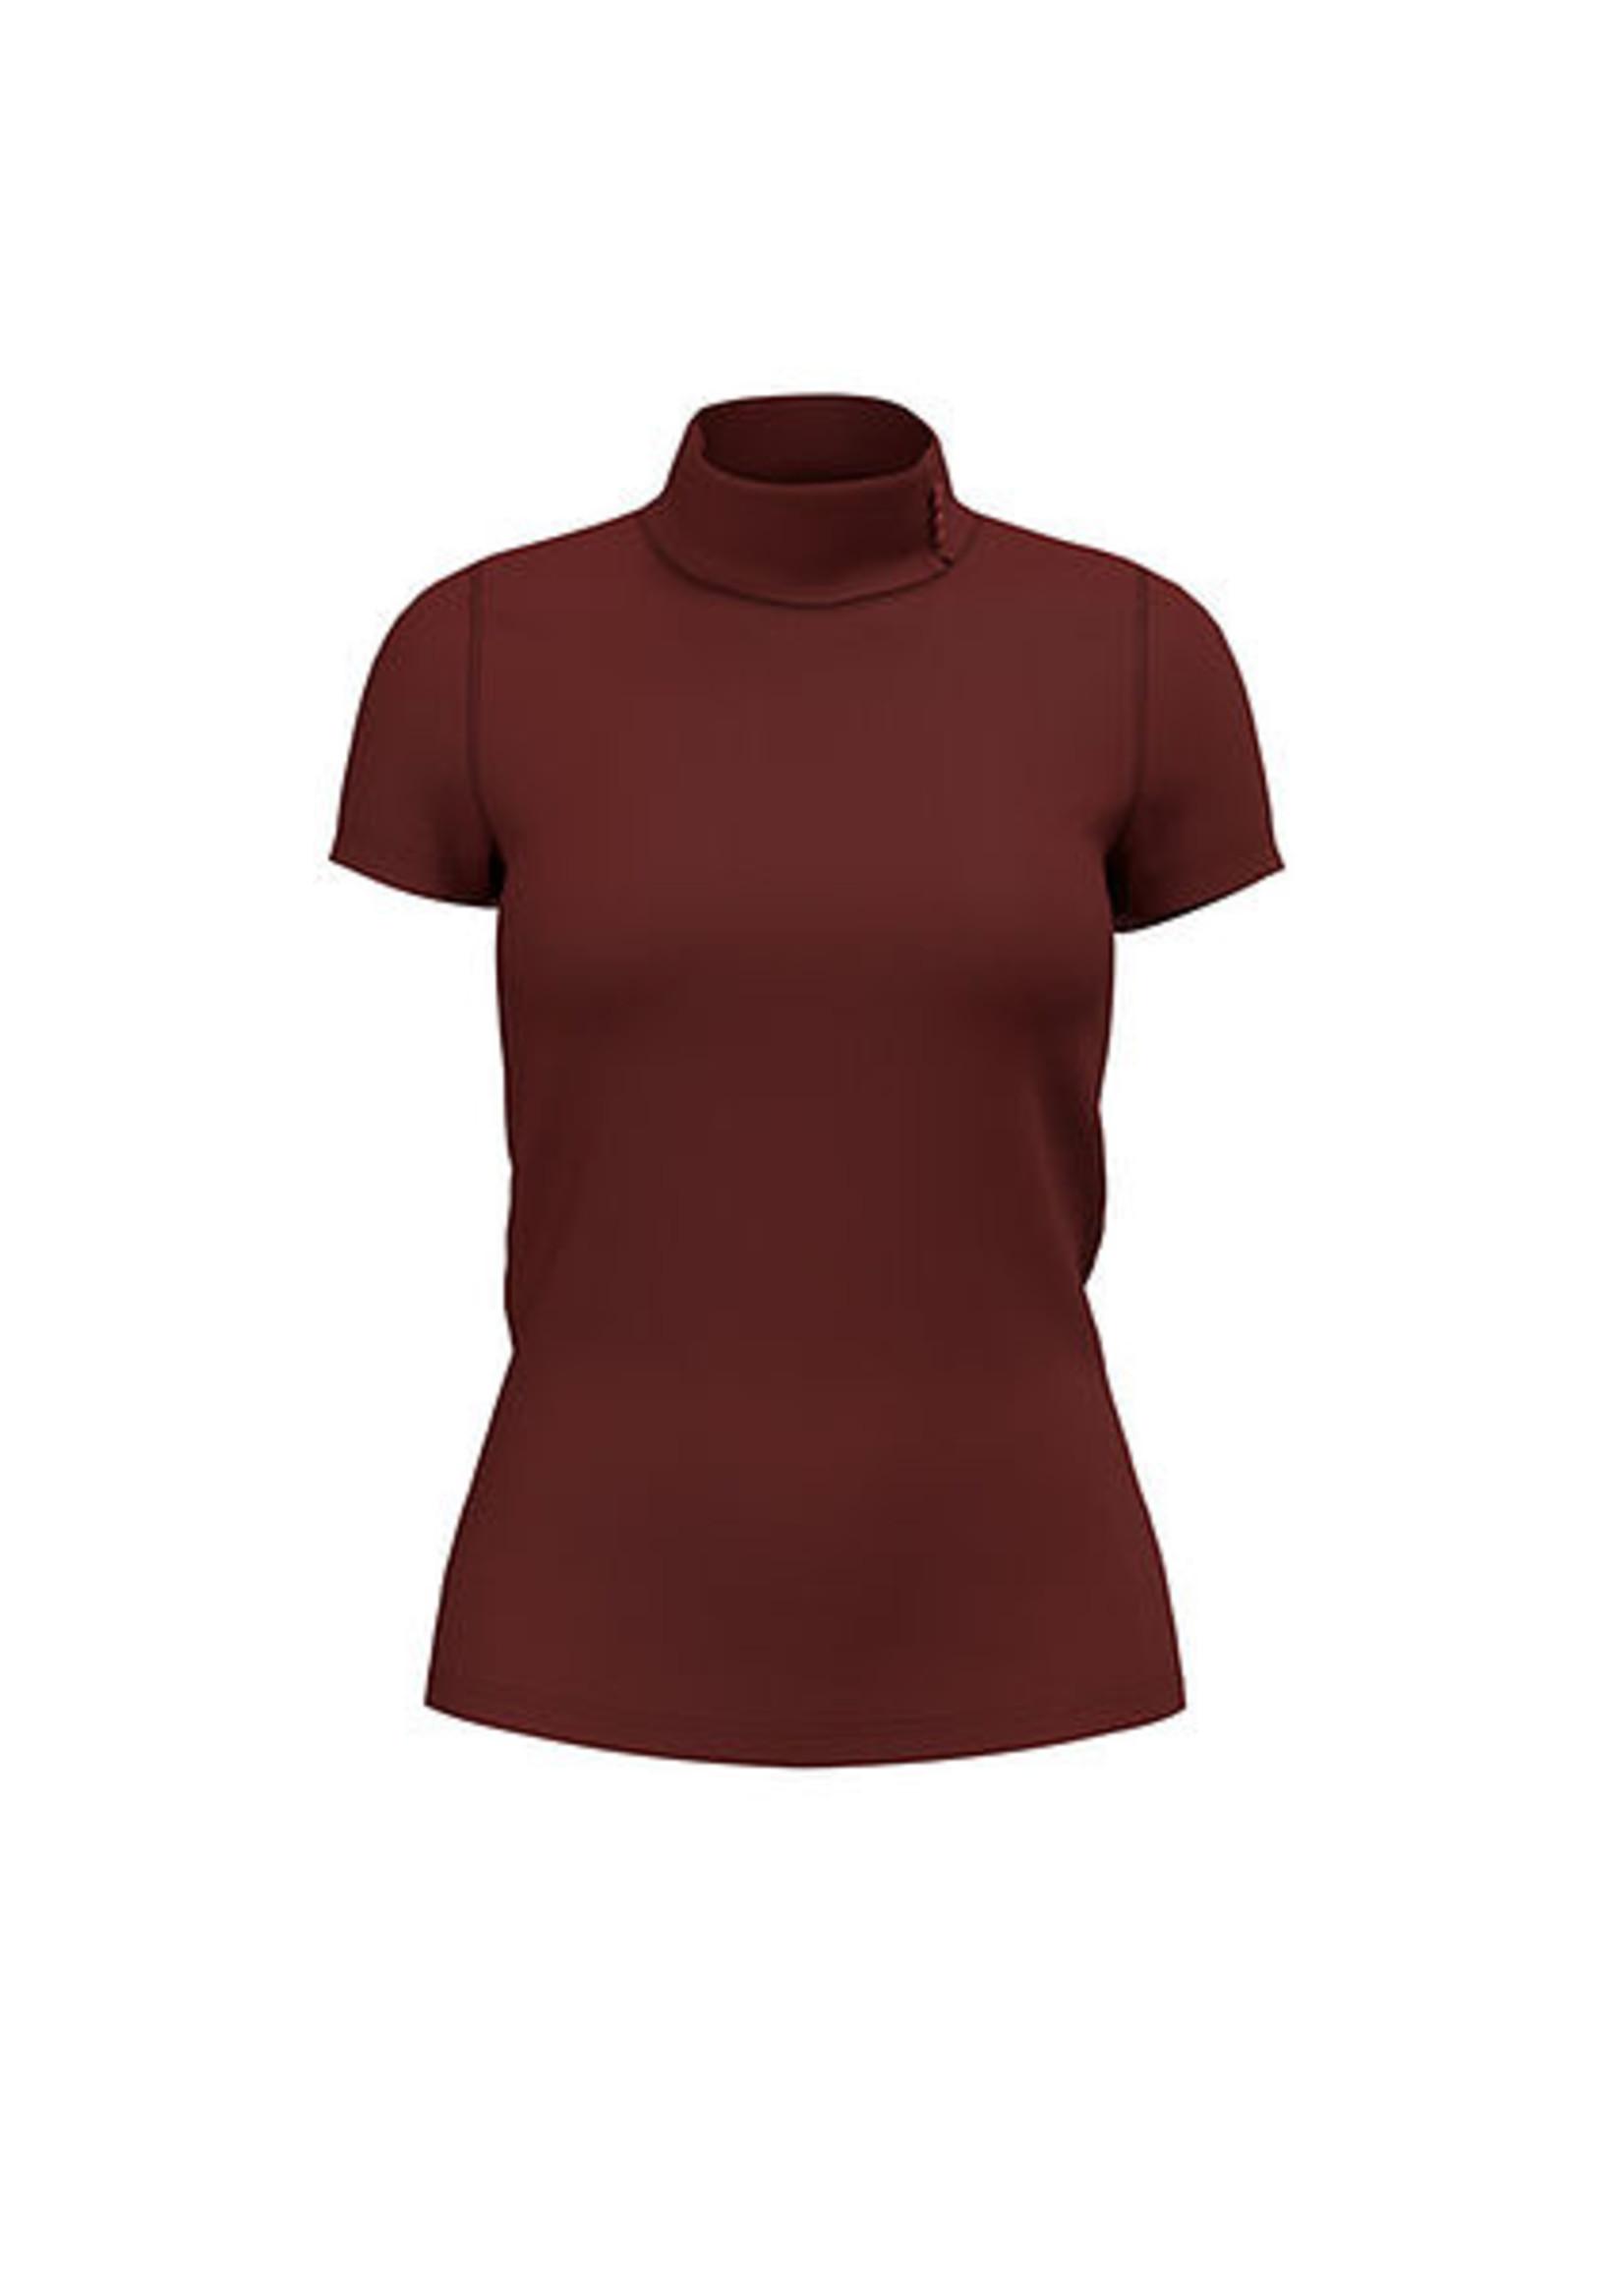 T-shirt RC 48.29 J14 cocoa